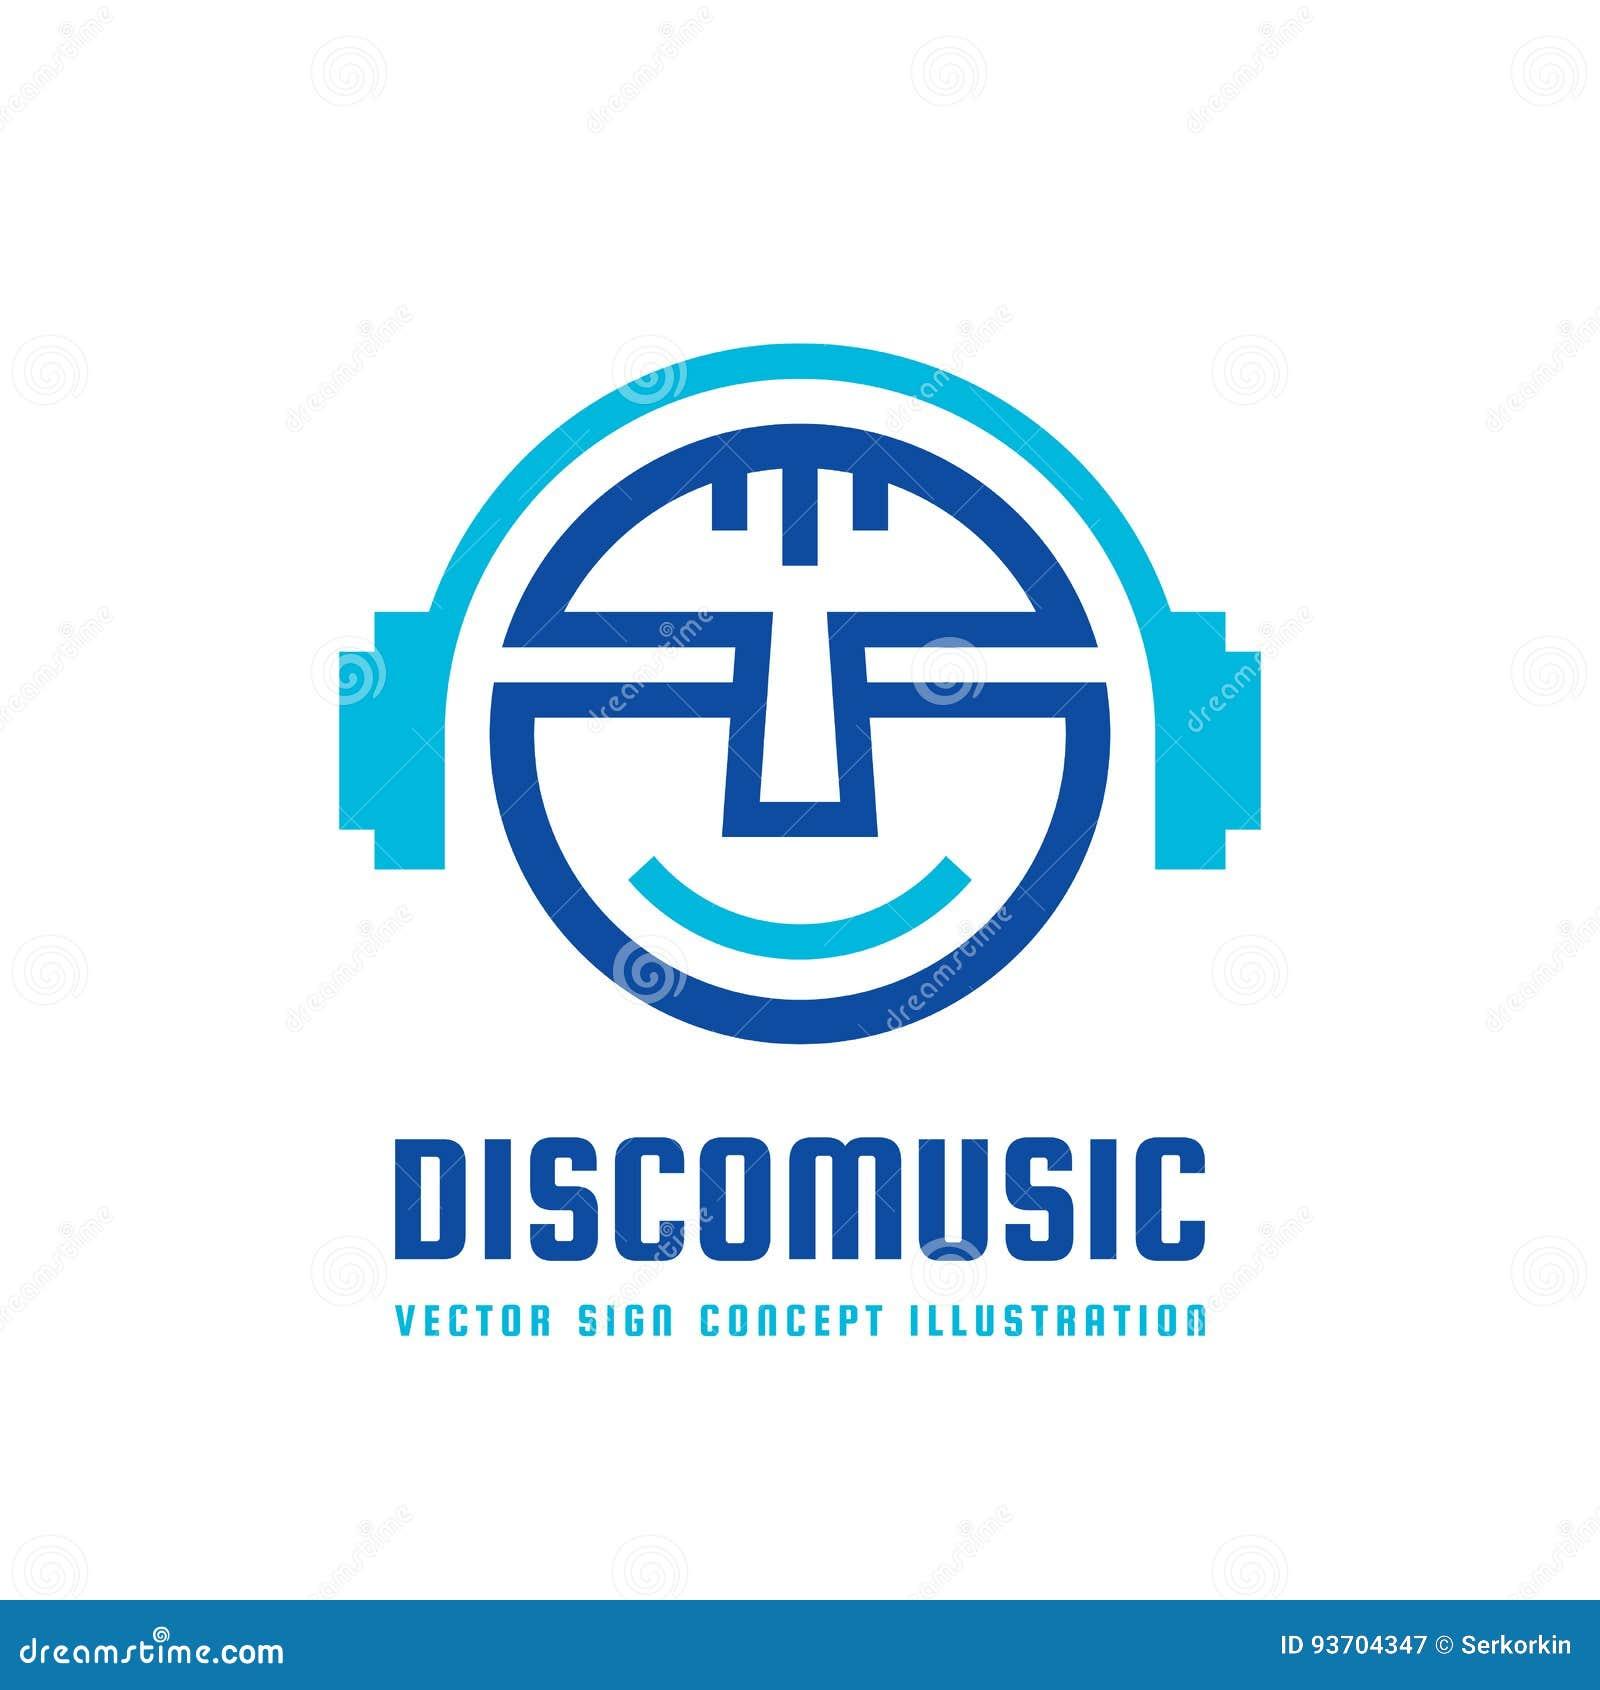 Disco Music - Vector Logo Concept Illustration In Flat Style Design